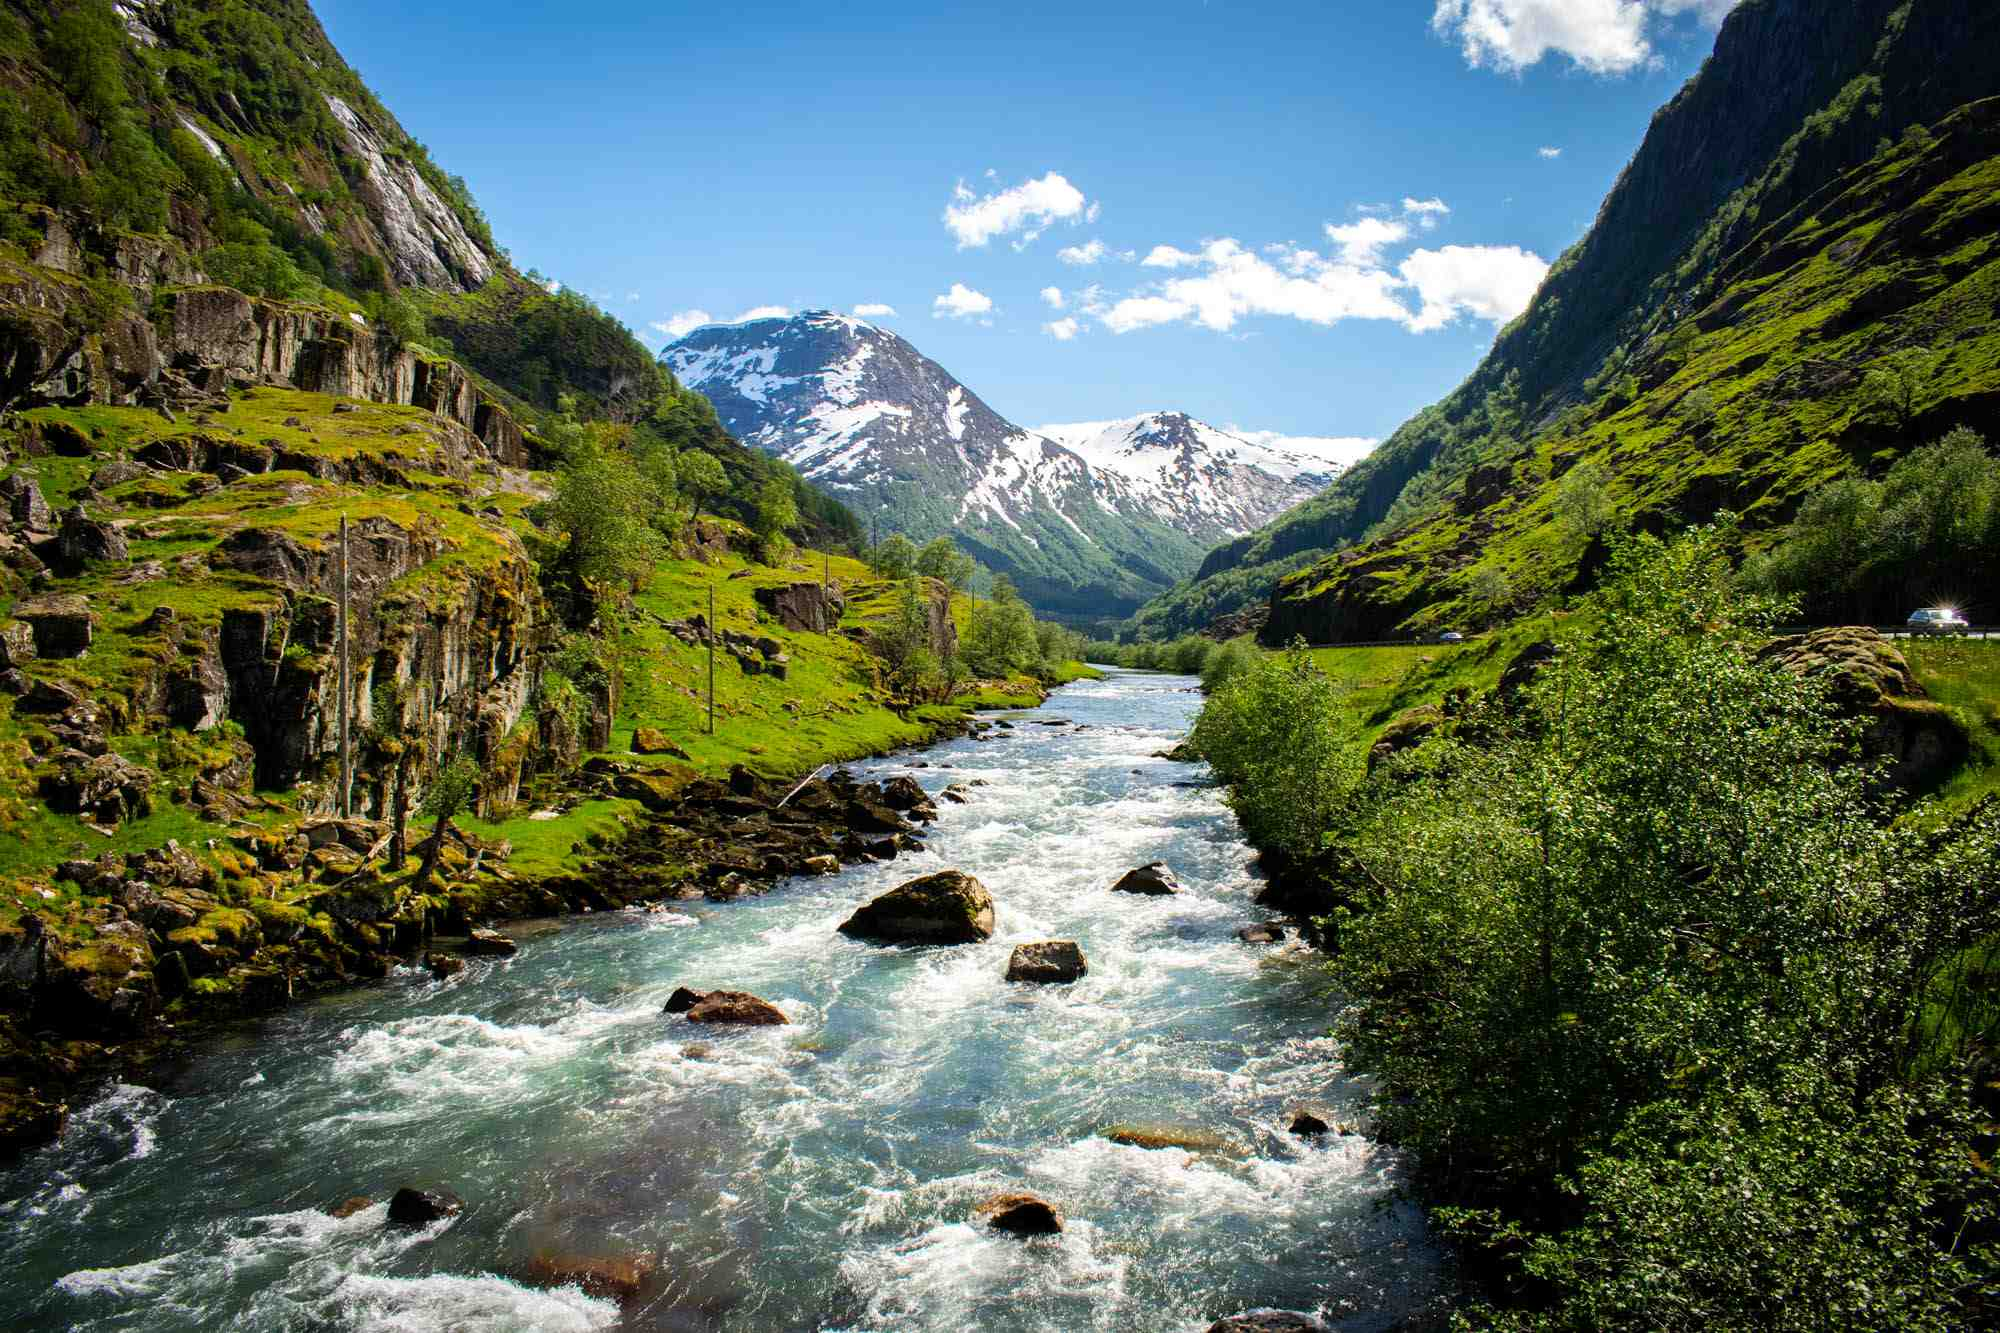 Stardalselva in Norway. Photo: Janicke Hansen